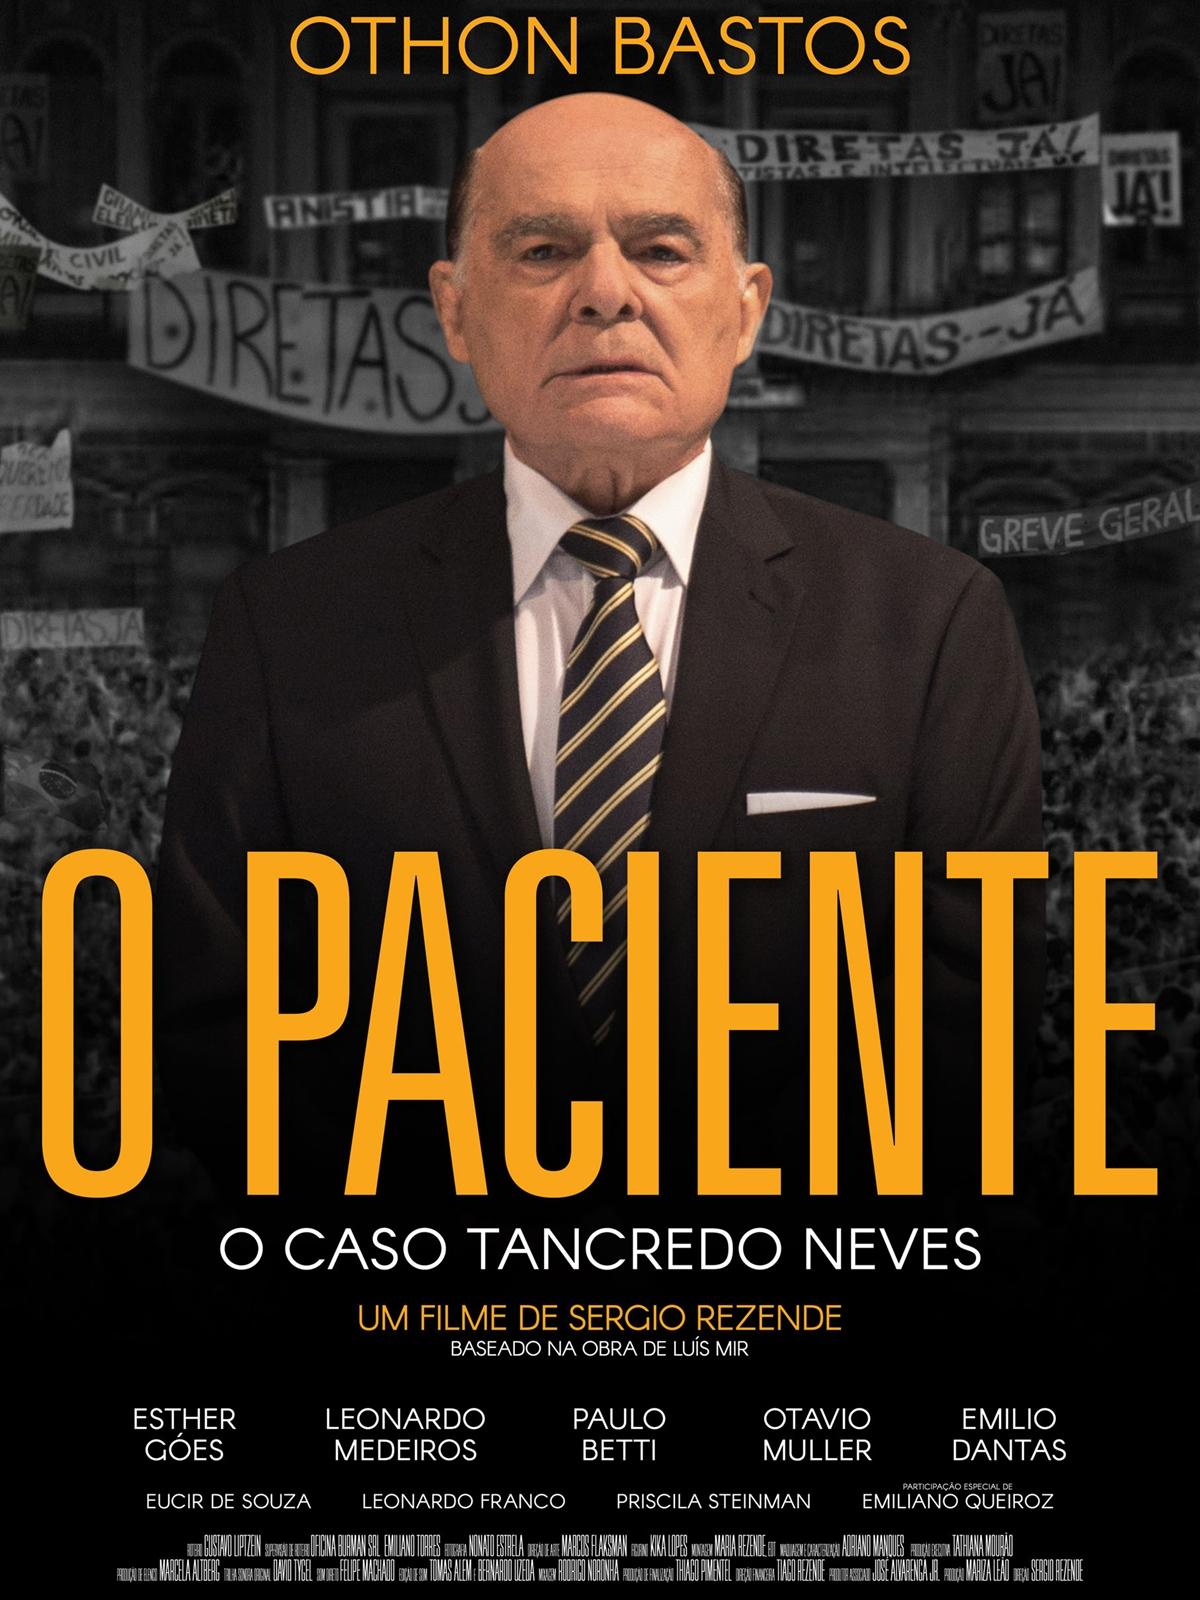 O Paciente - O Caso Tancredo Neves  Filmes similares - AdoroCinema cd71a77d9185b